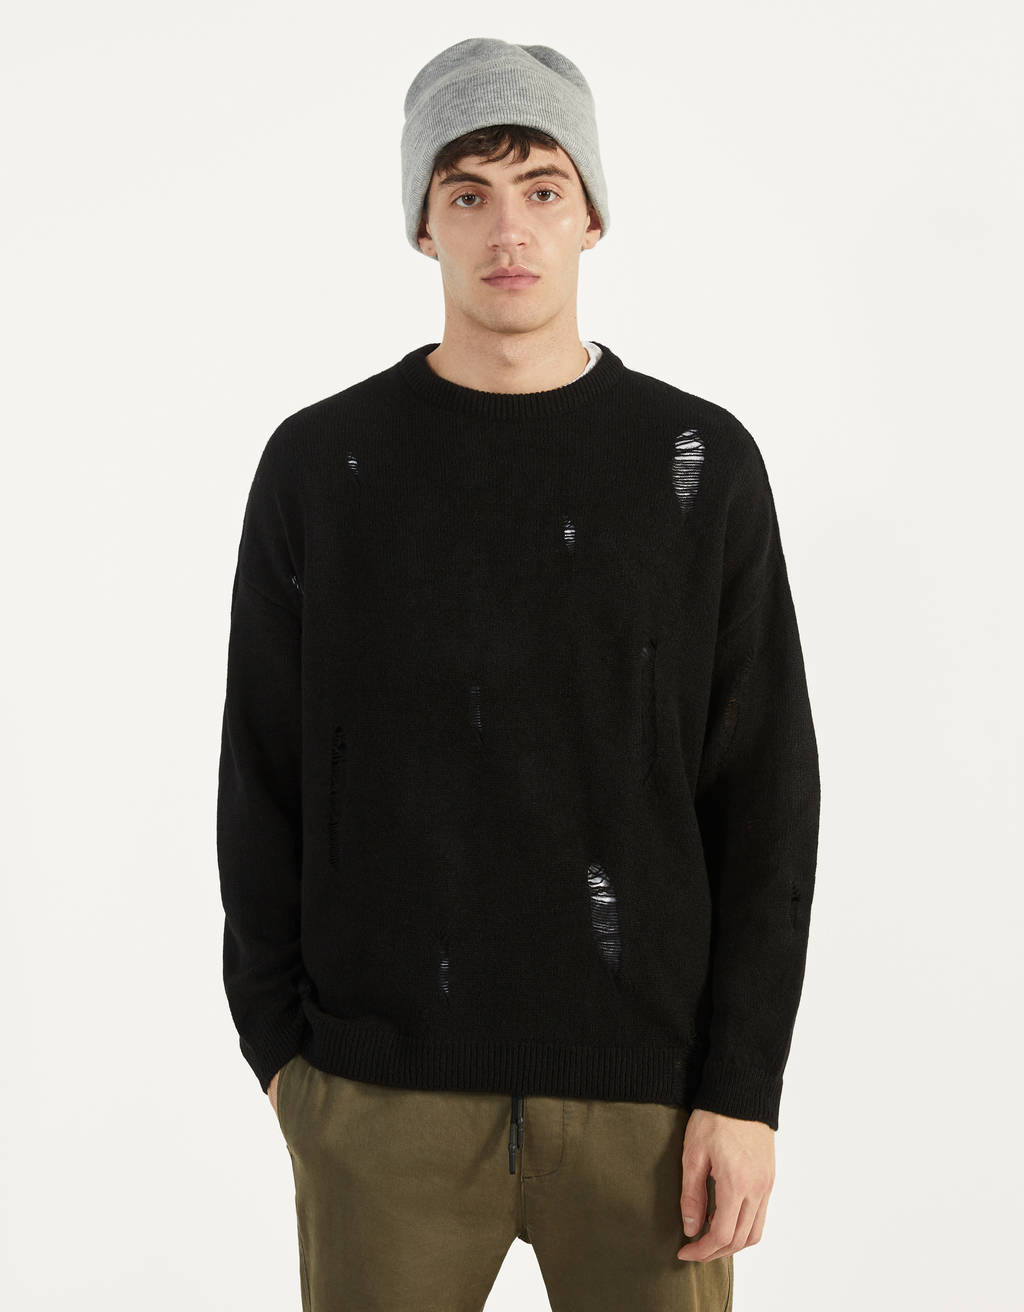 Sweater com rasgões